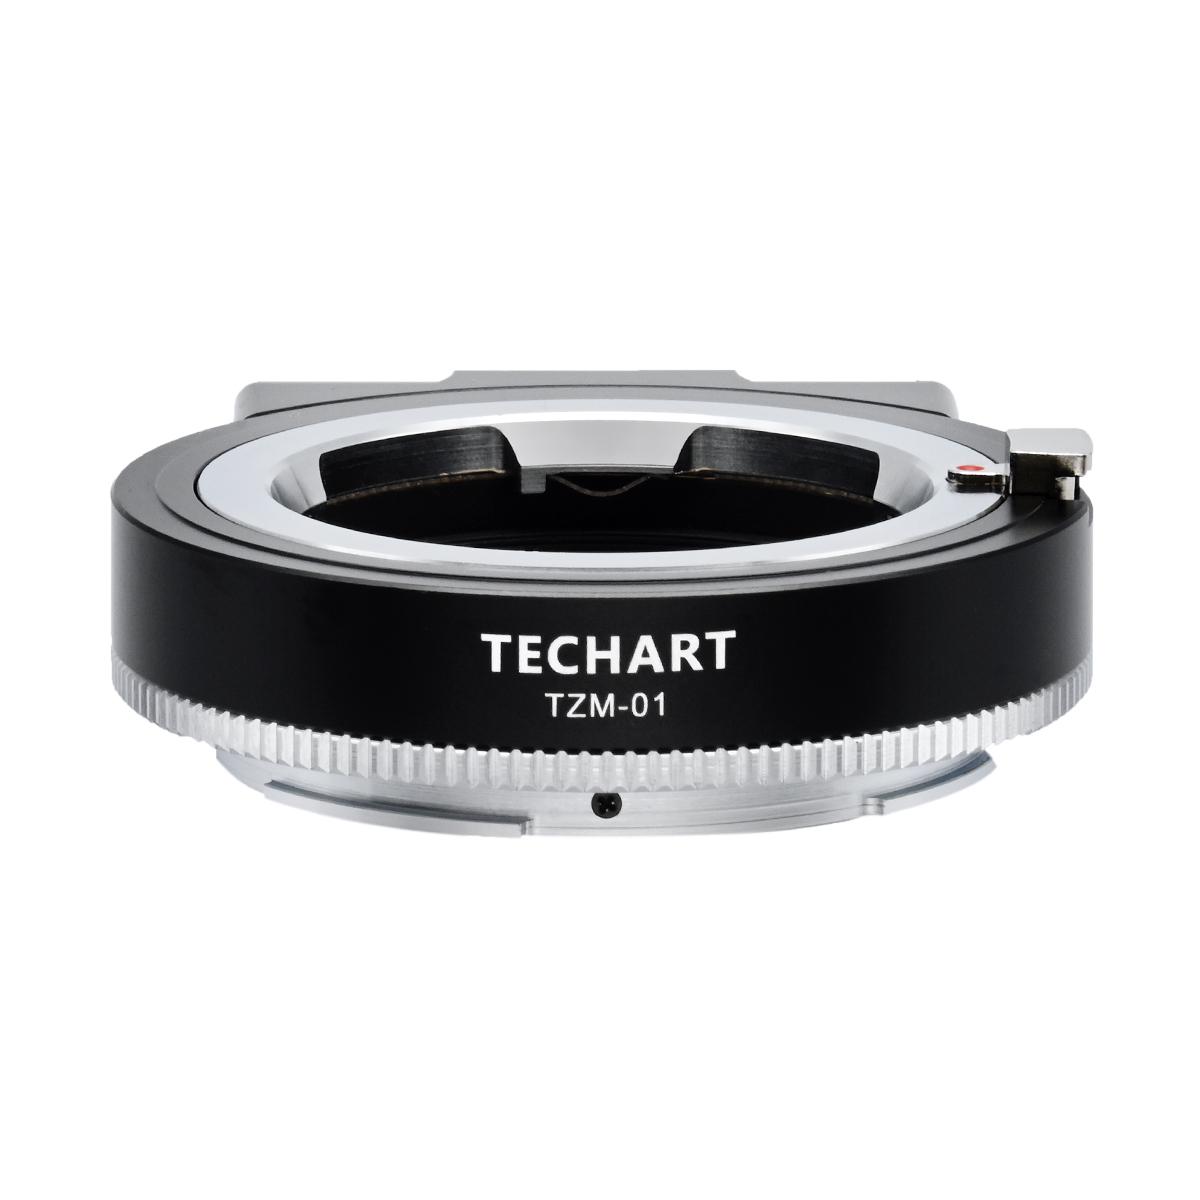 TECHART TZM-01(ライカMマウントレンズ → ニコンZマウント)電子アダプター